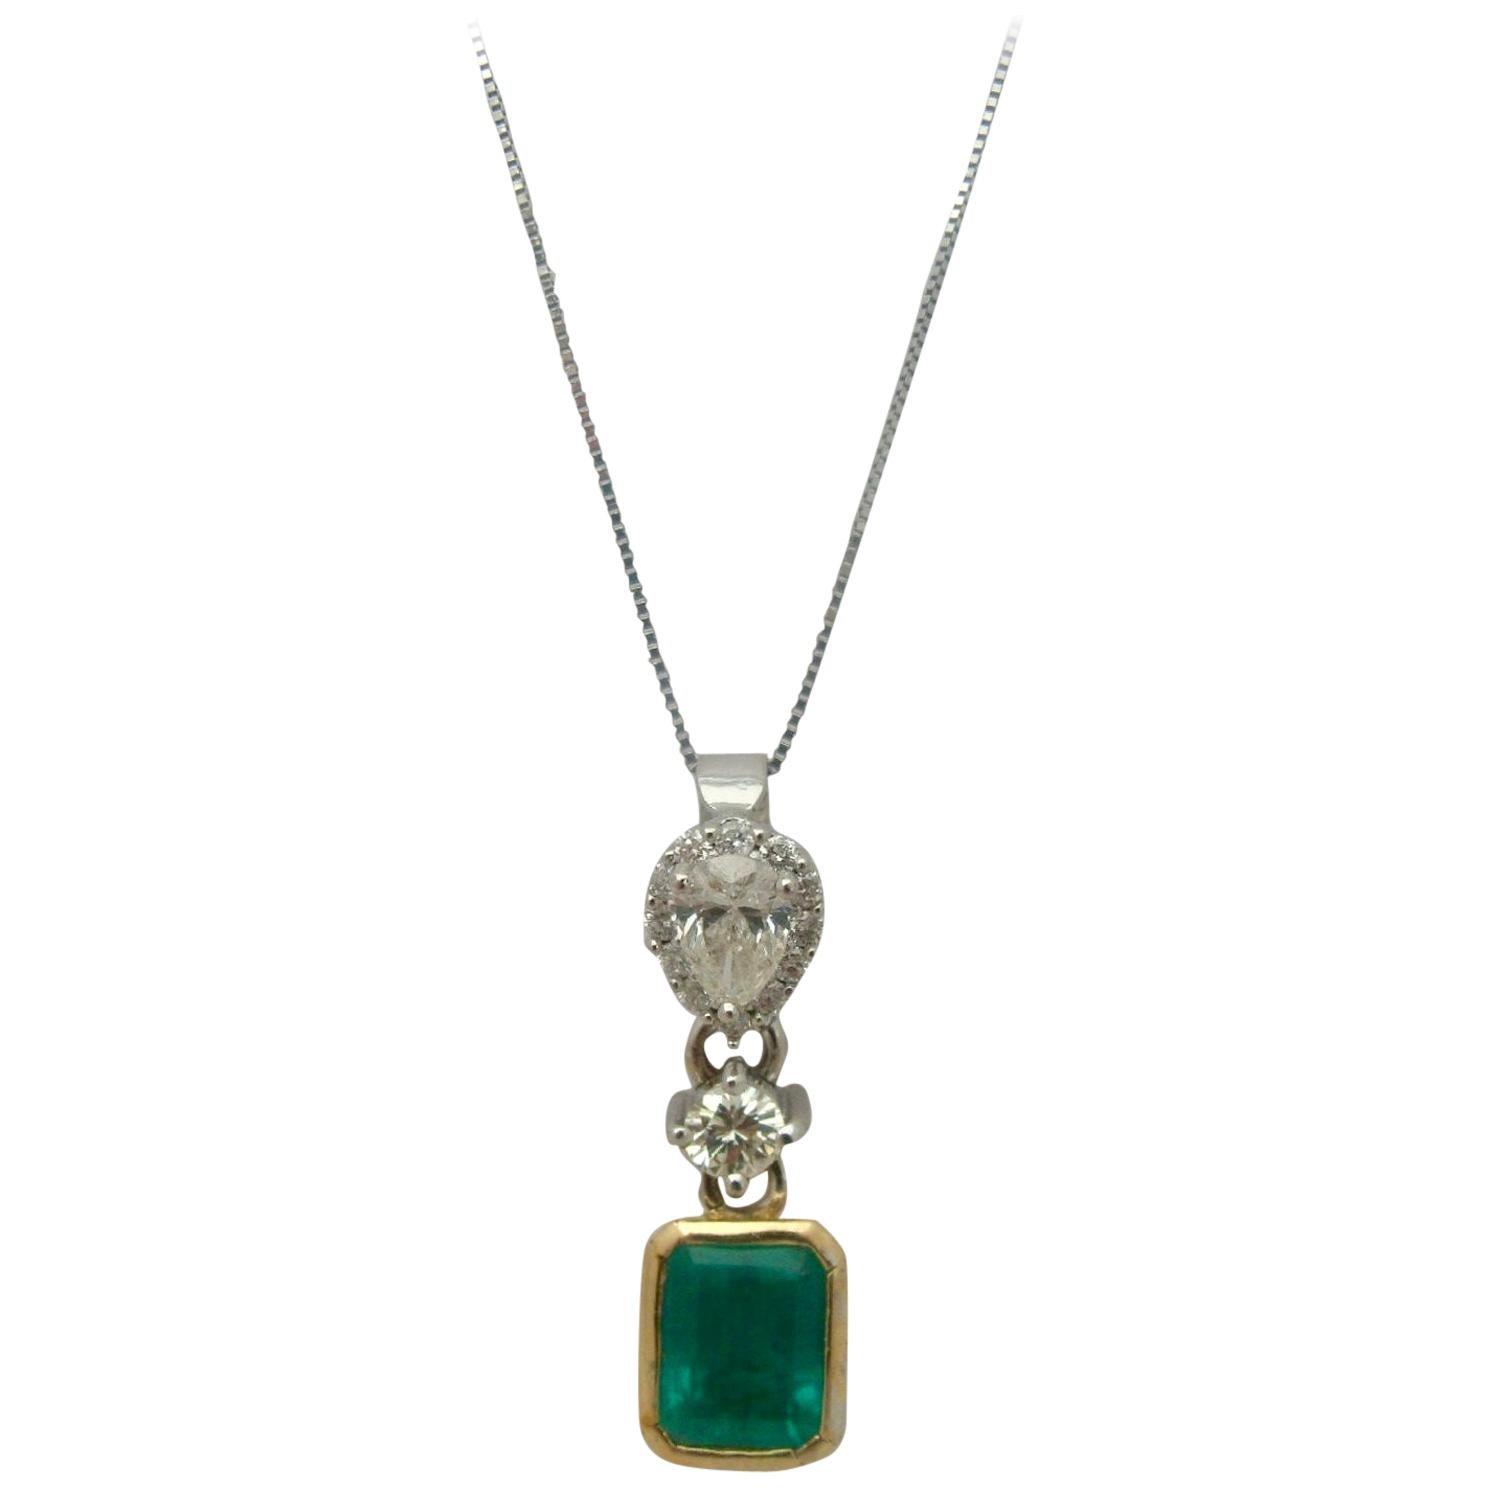 4.00 Carat Colombian Emerald and Diamond Pendant 18 Karat